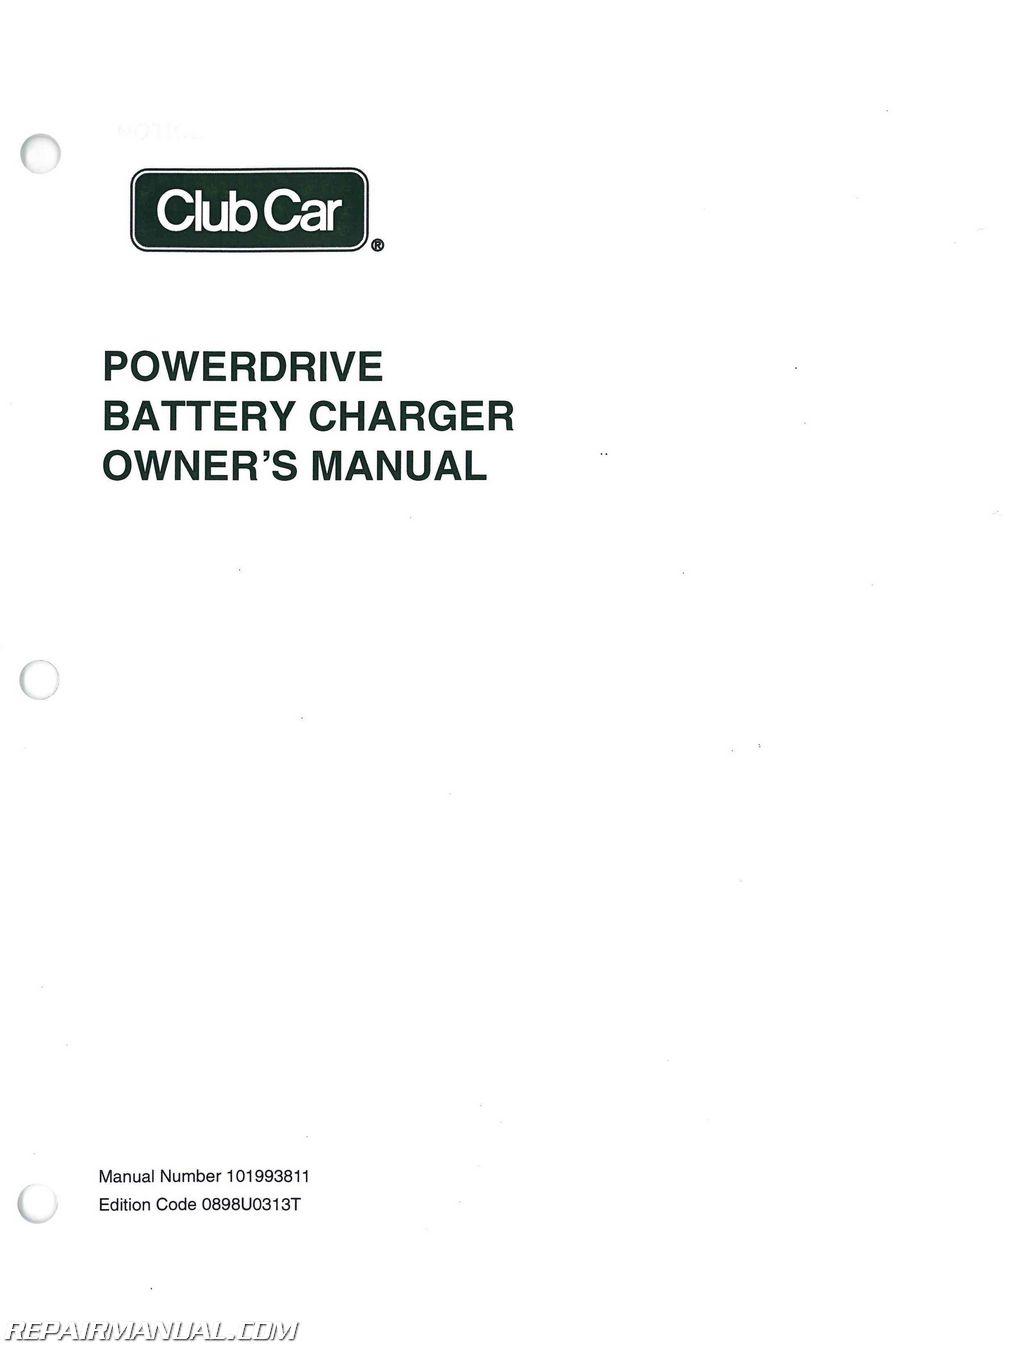 club car domestic export european powerdrive battery charger owners rh repairmanual com club car powerdrive 2 charger model 22110 manual club car powerdrive 2 charger model 22110 manual